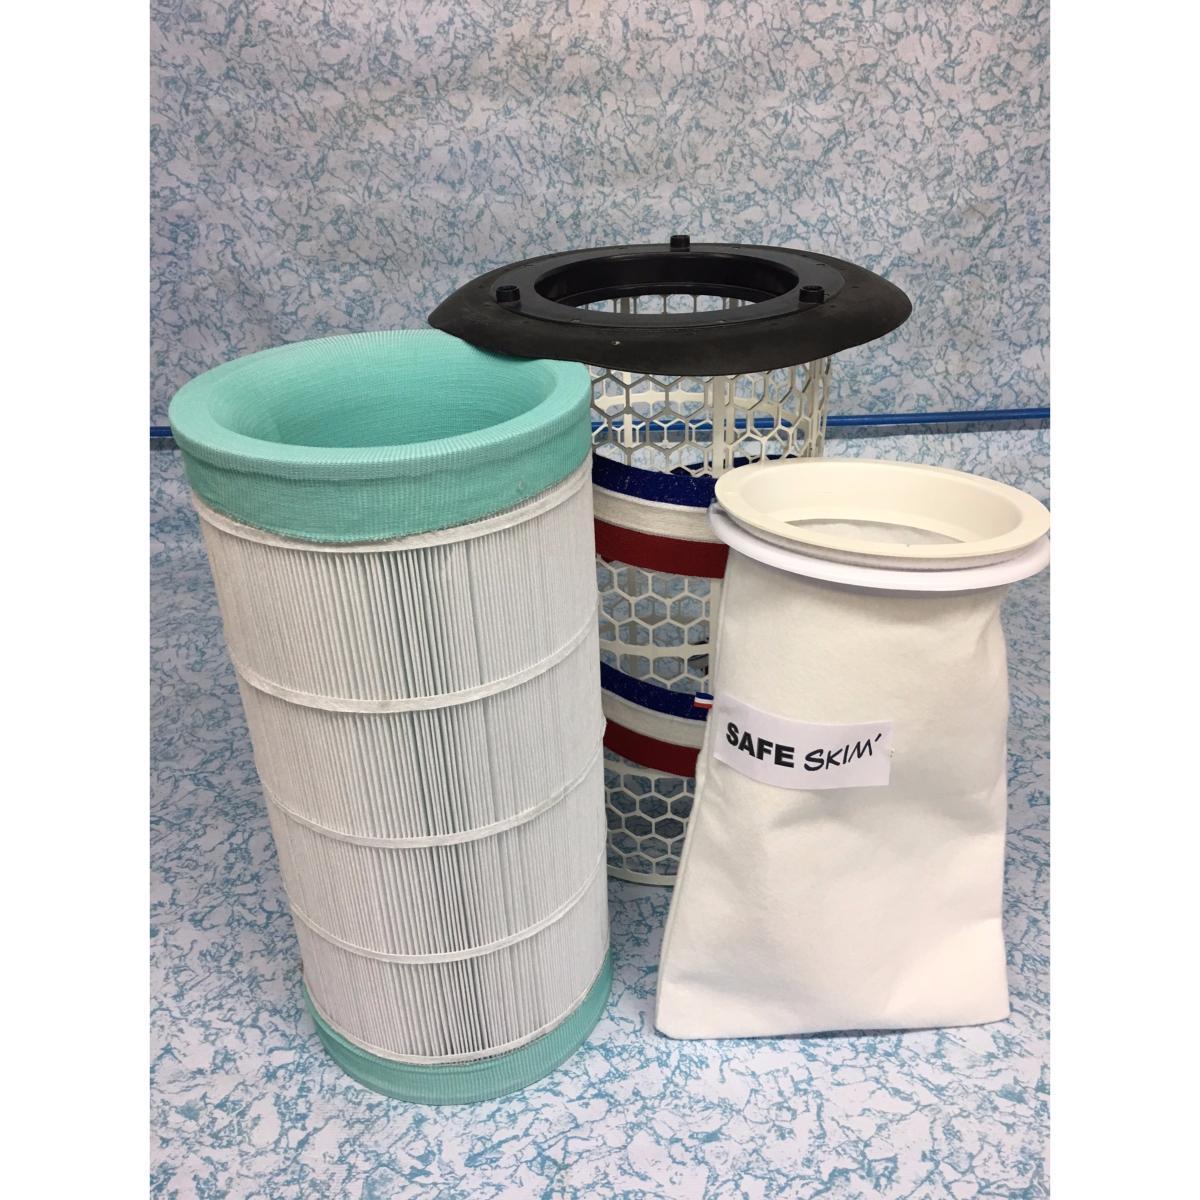 Filtration piscine micron - Comment nettoyer un filtre de piscine ...